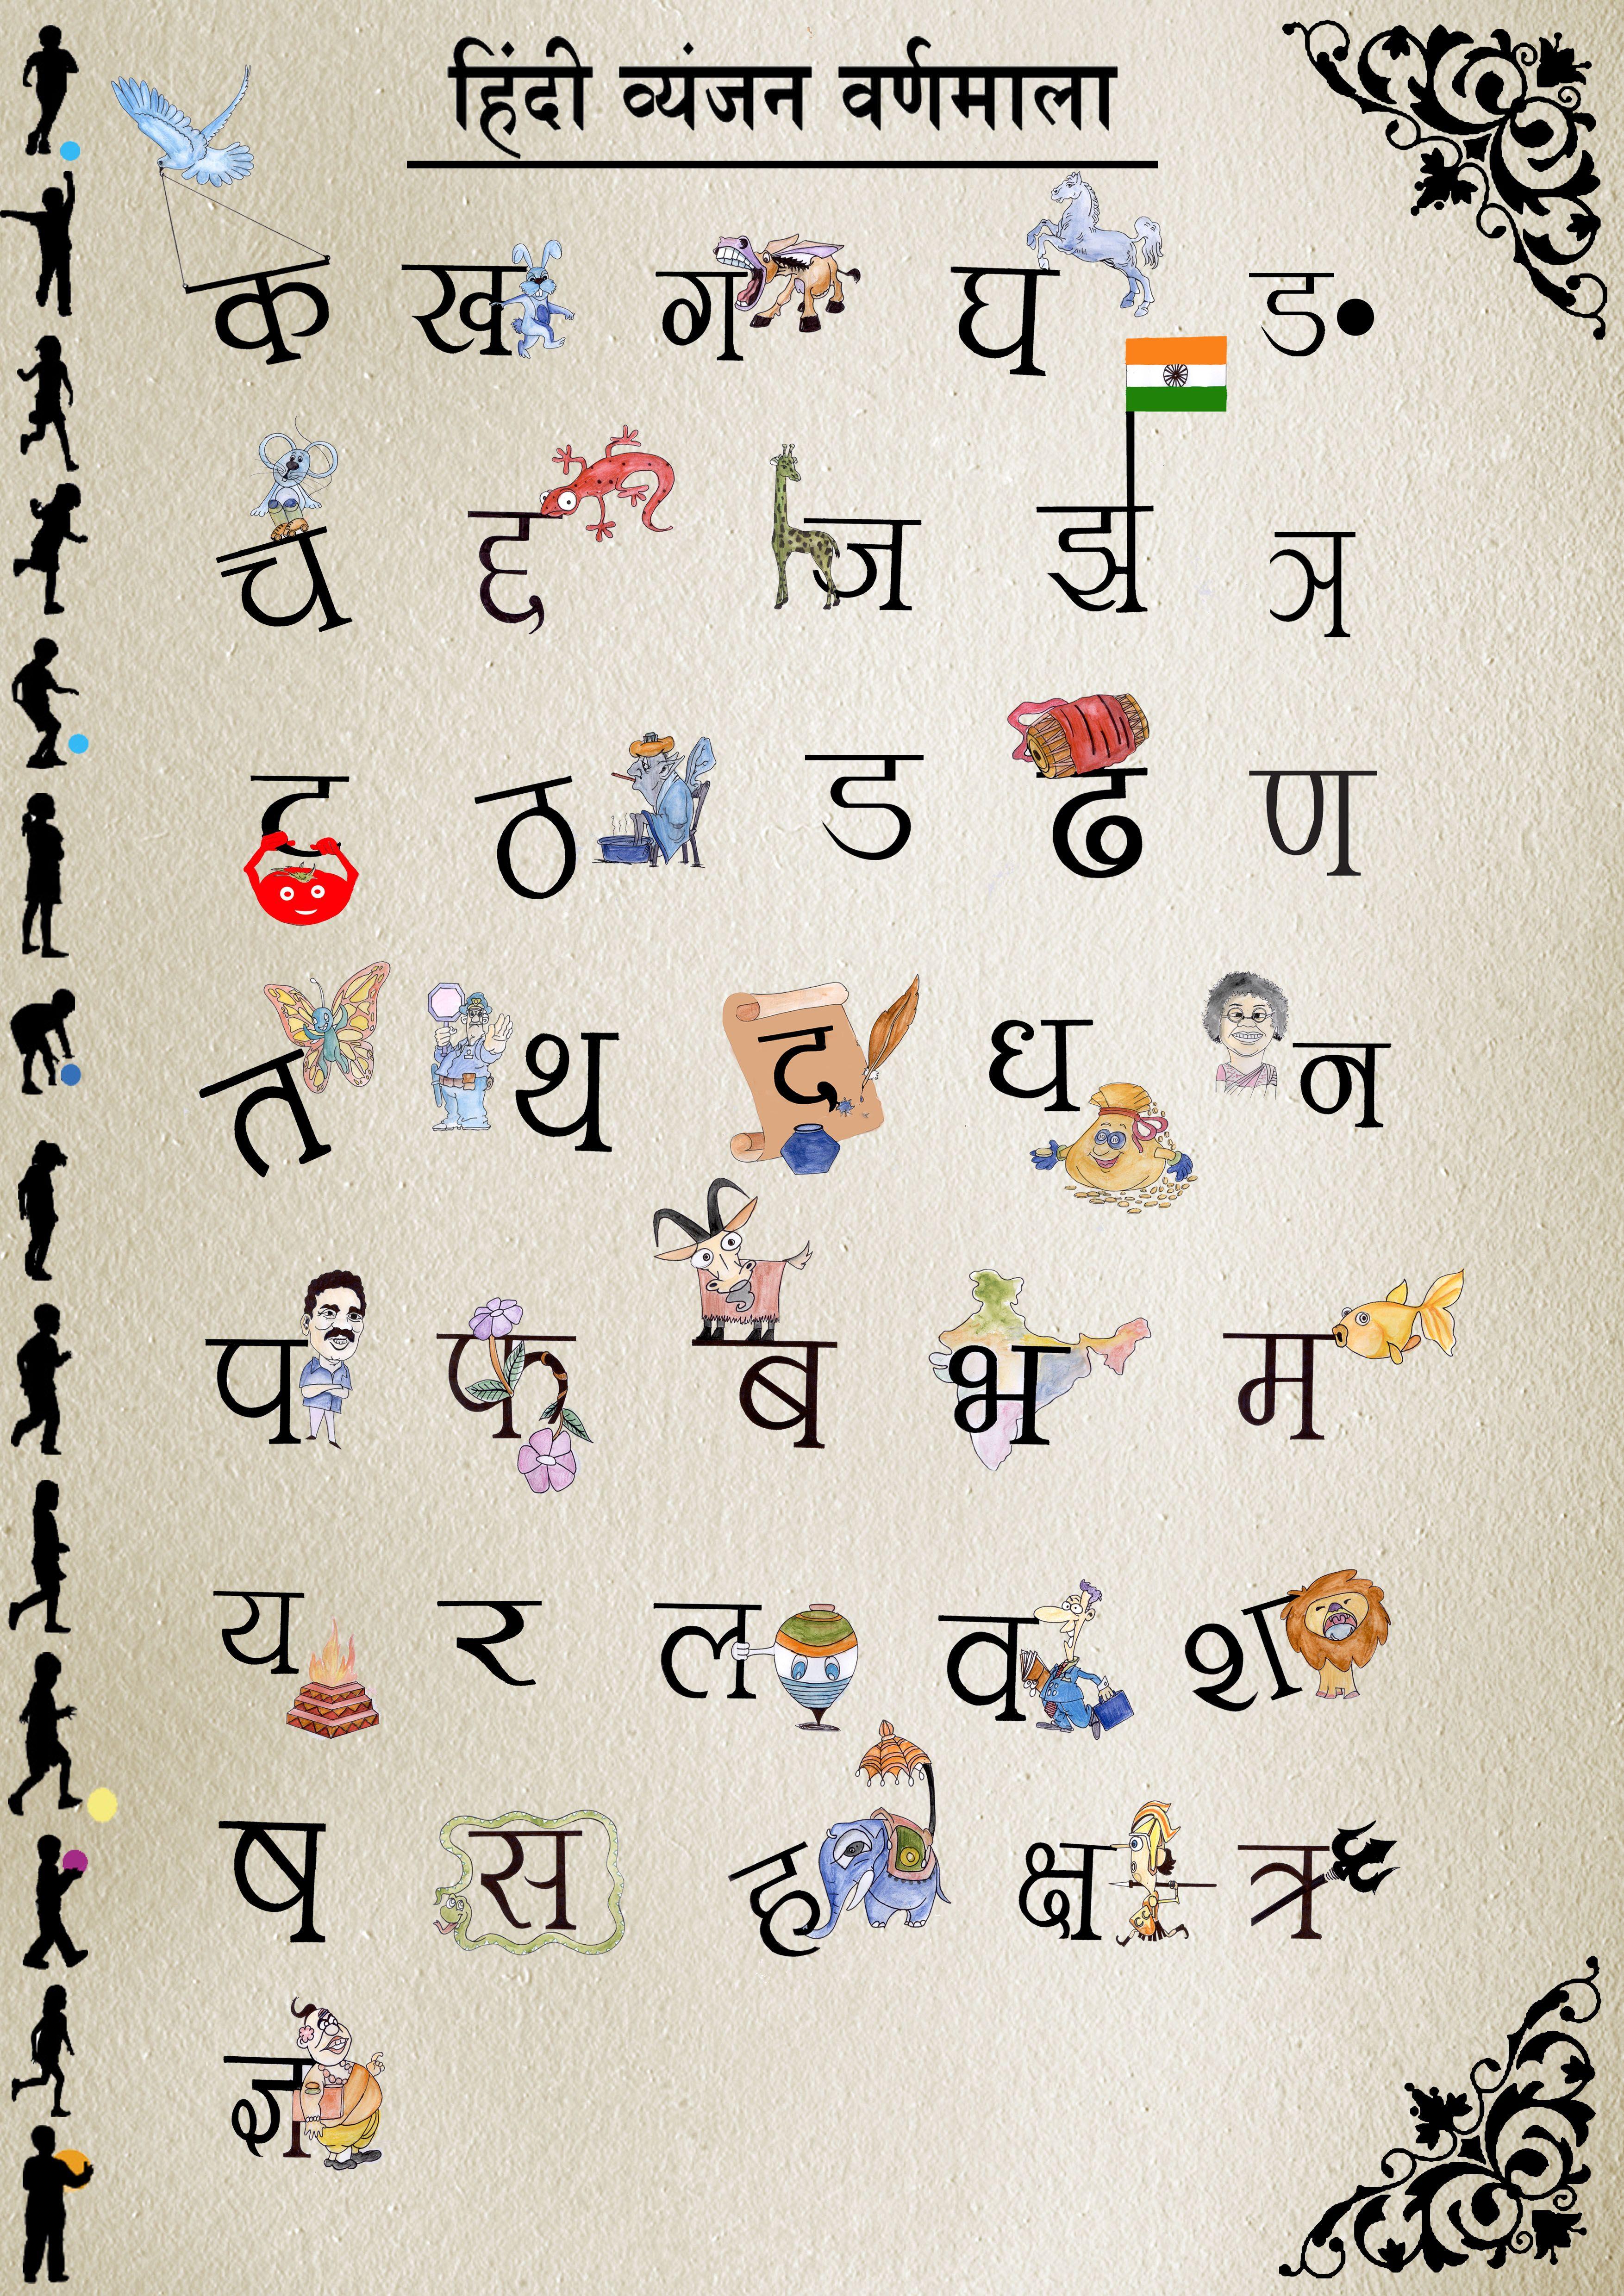 Illustrations fuente hindi motivacion de los estudiantes parrafo sanscrito idioma also seasons chart pinterest learn language  rh